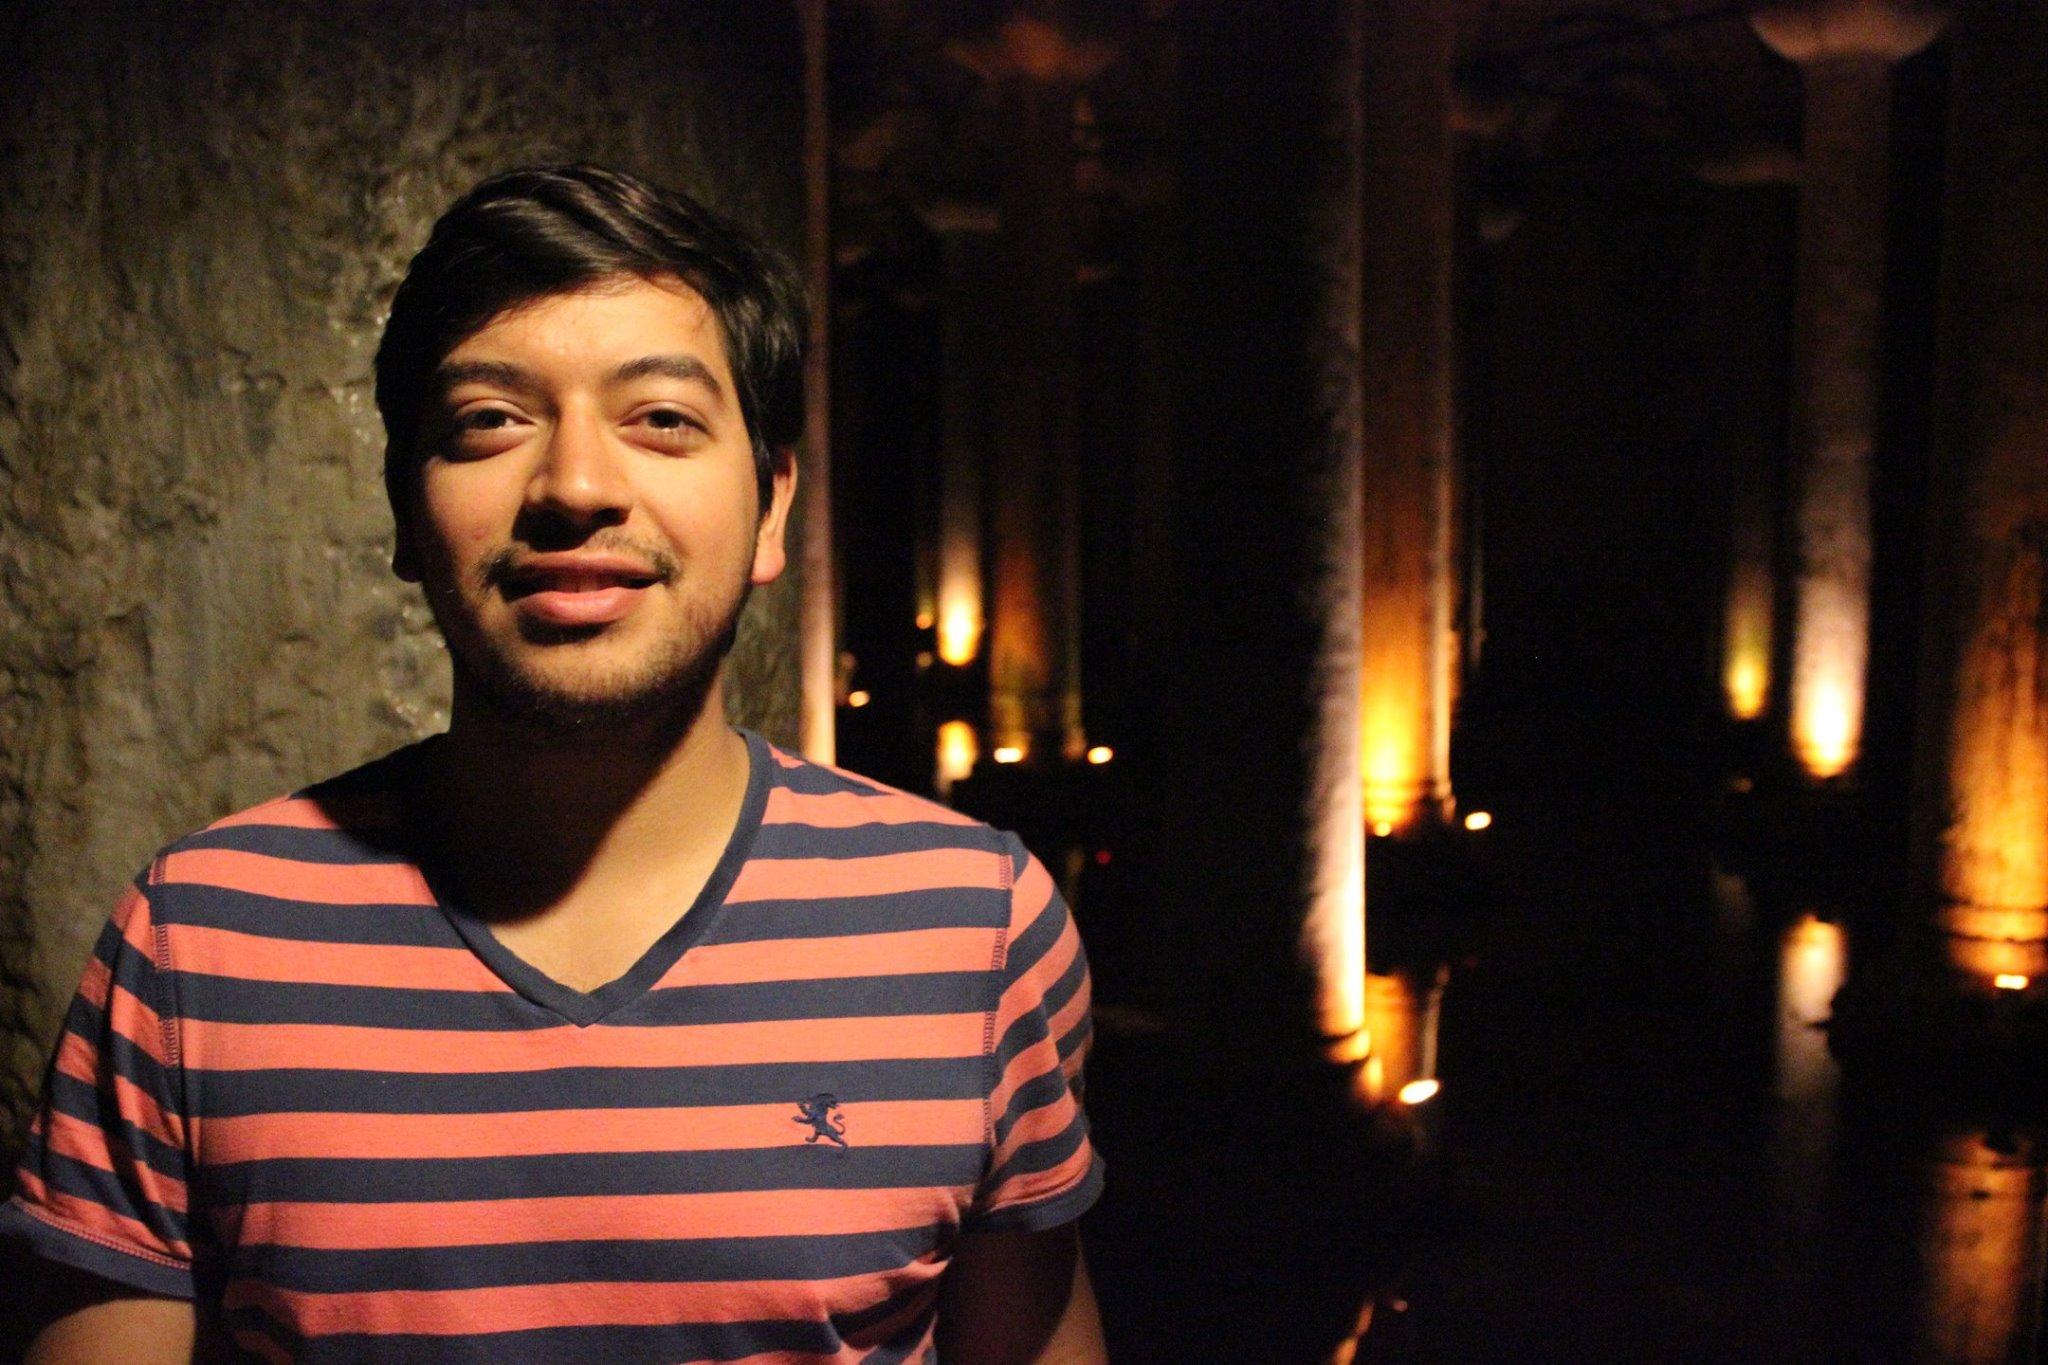 A Photo of Sergio Cheko Cantu